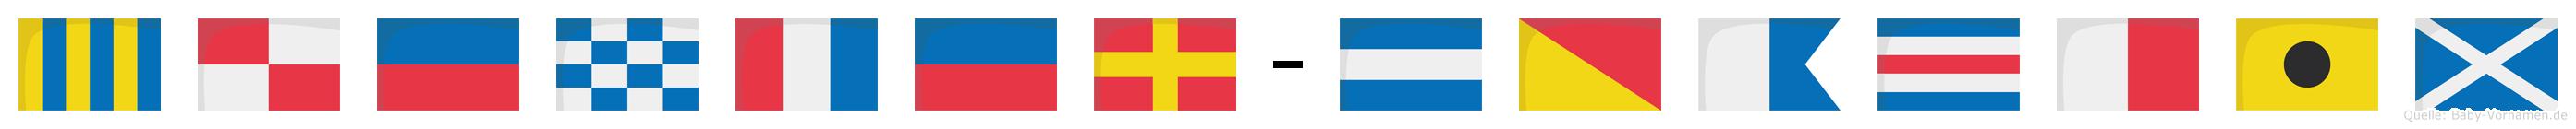 Günter-Joachim im Flaggenalphabet